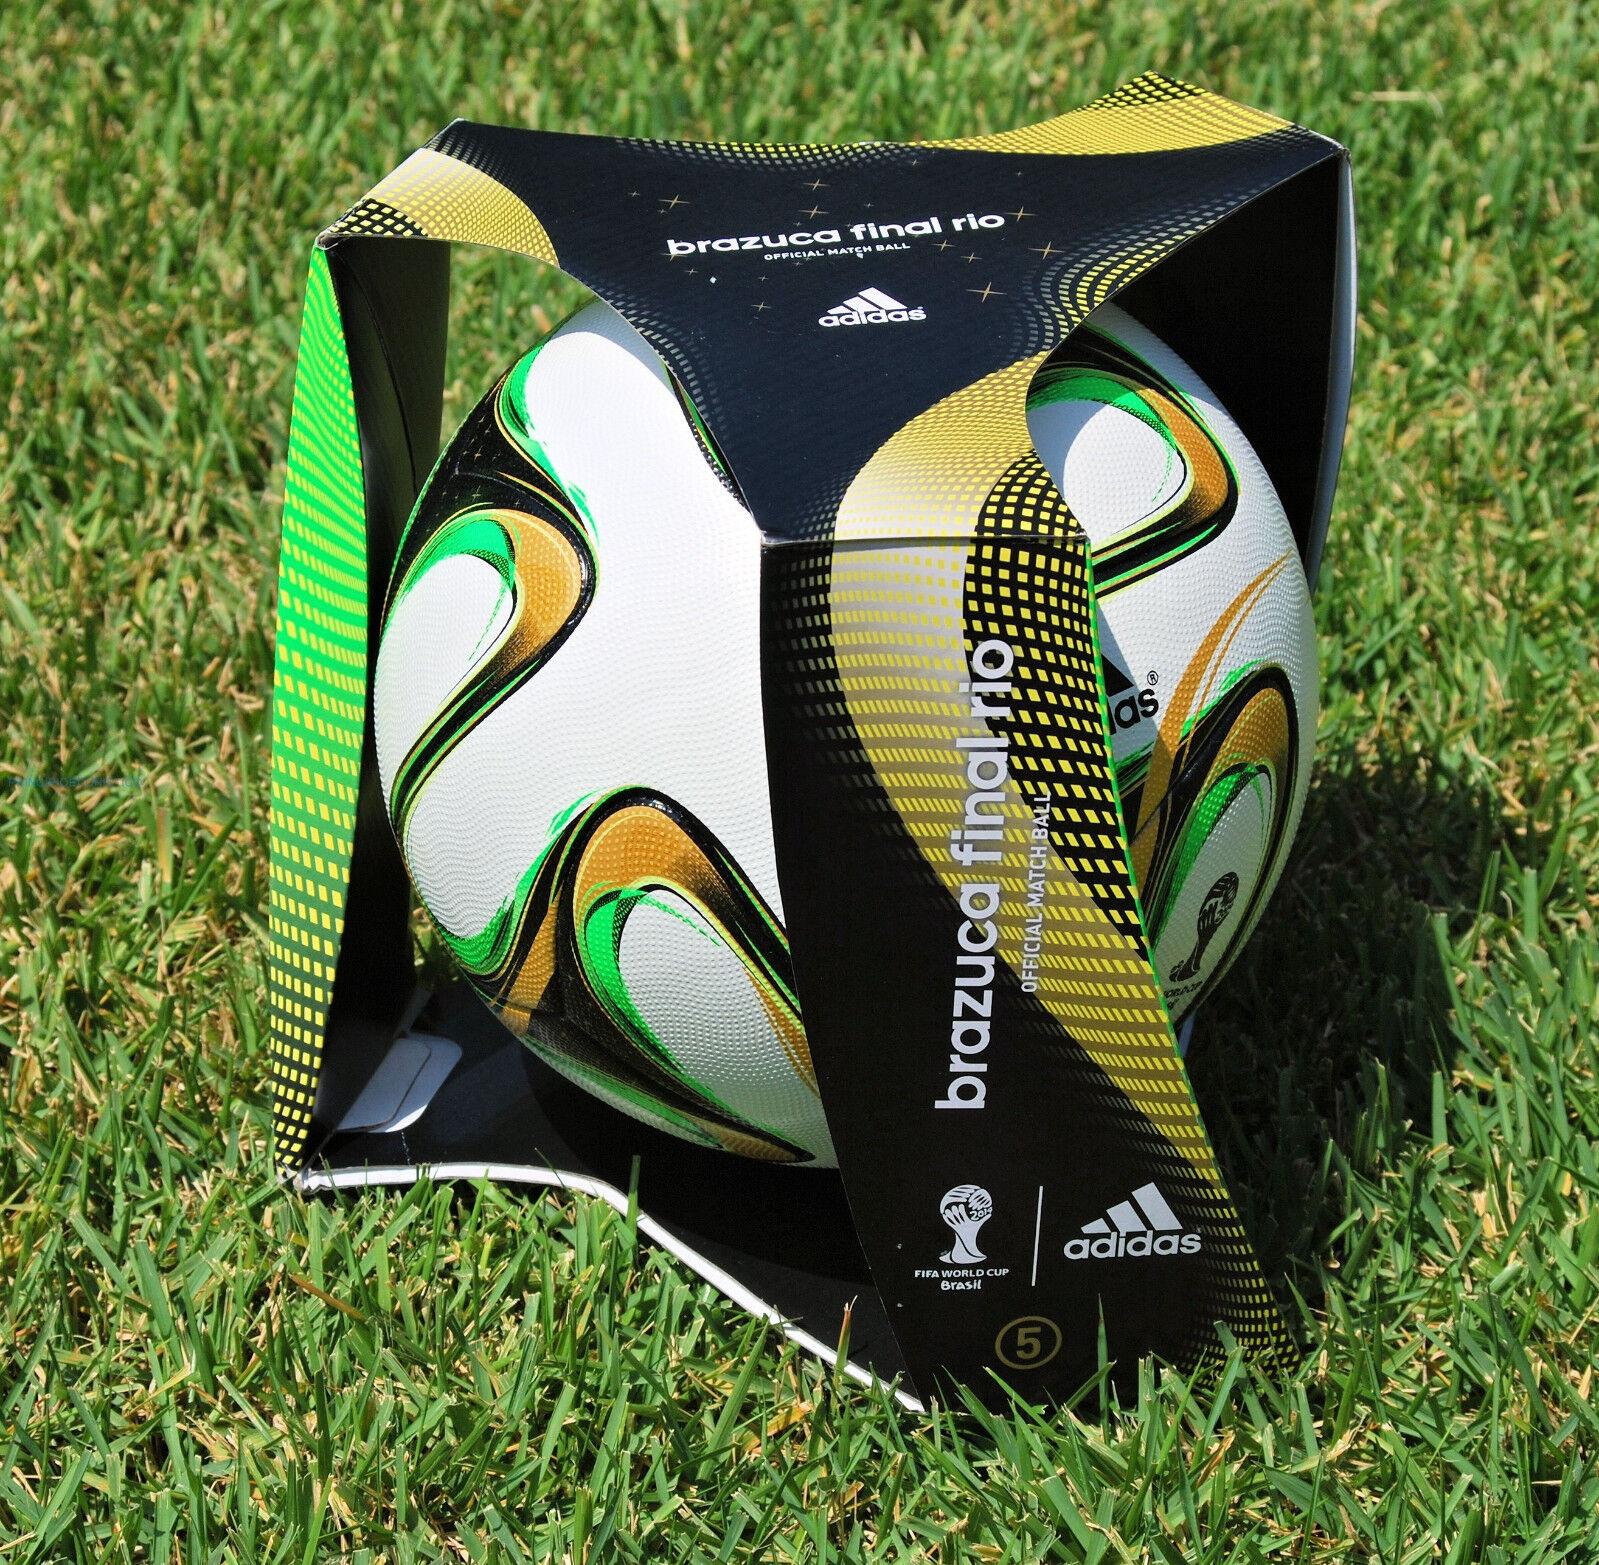 Pallone Adidas Brazuca Final Nuevo Original Fifa Mundiales Fútbol Brasil